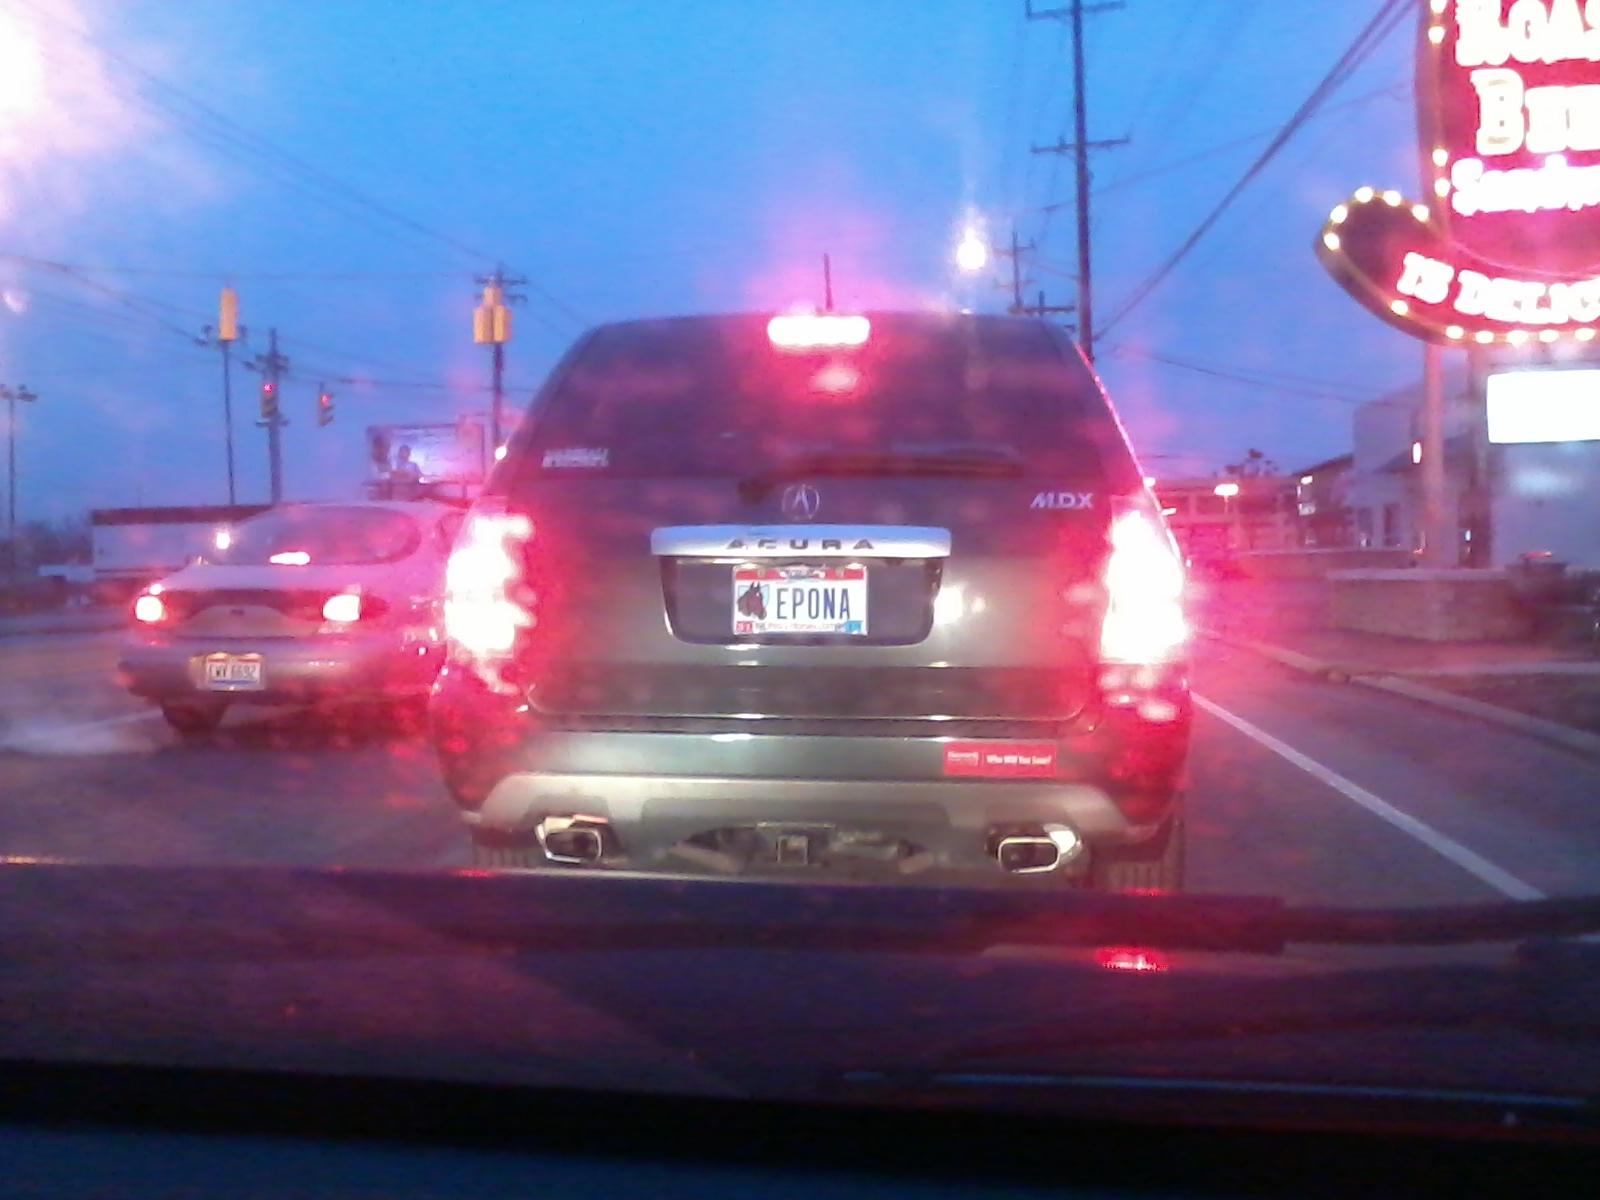 epona license plate